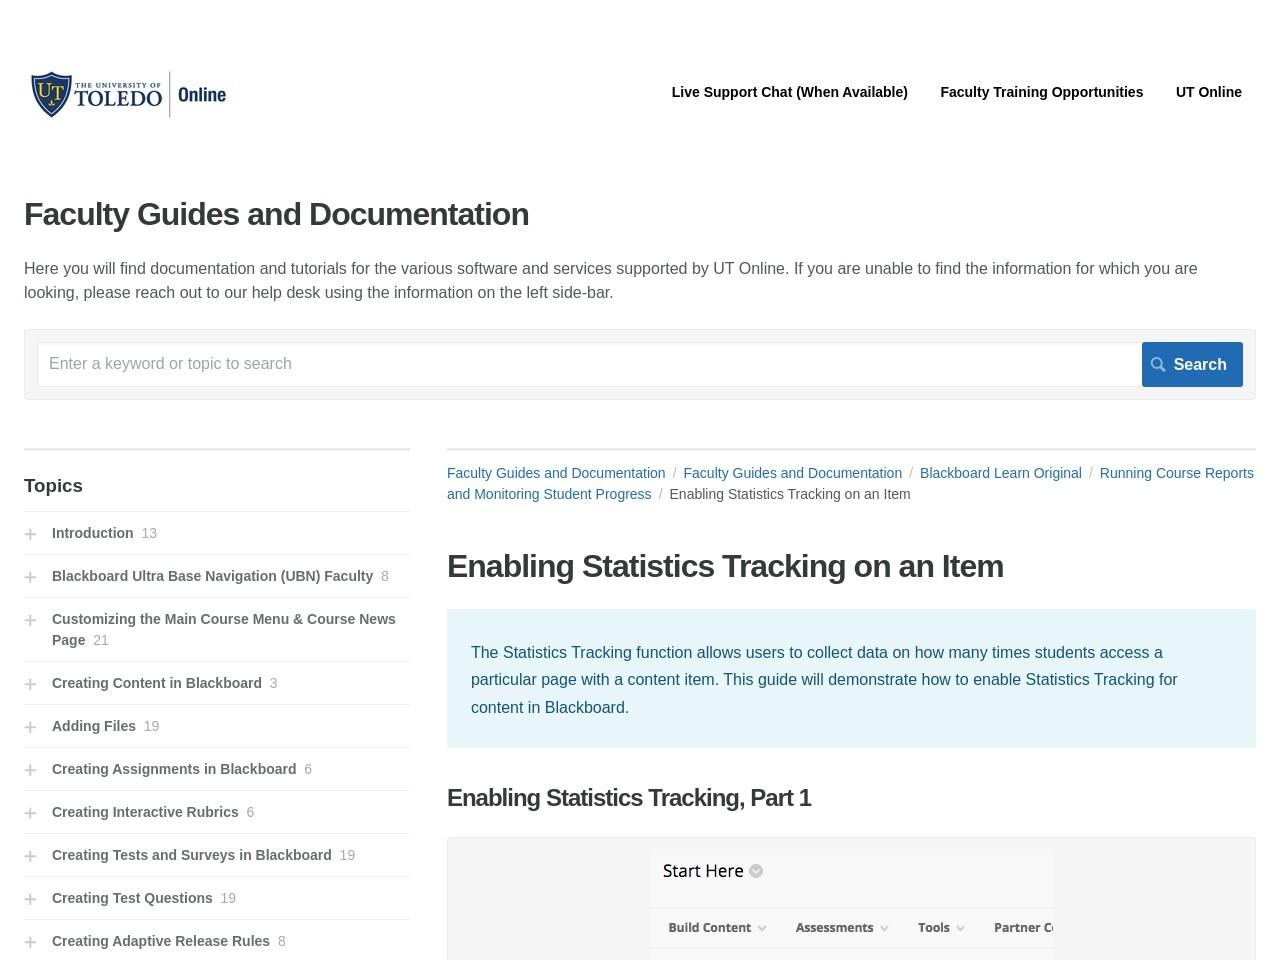 Enabling Statistics Tracking on an Item | Blackboard Learn ...